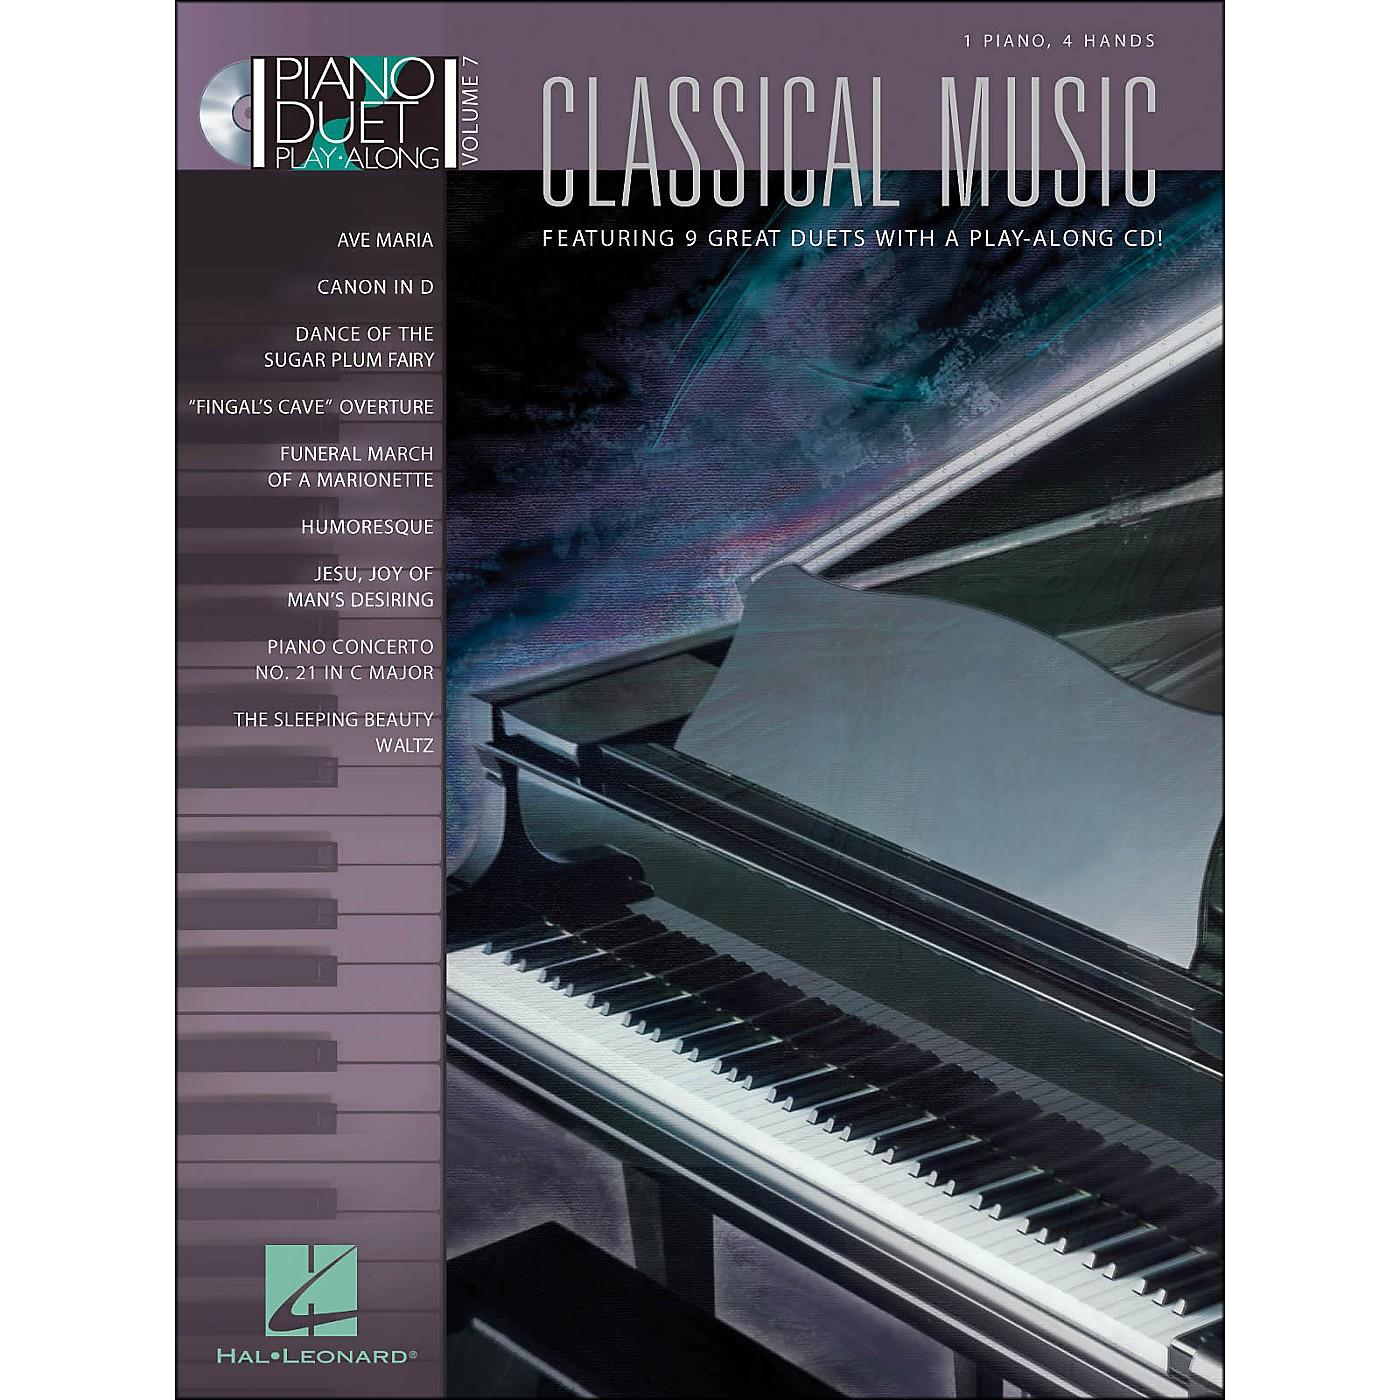 Hal Leonard Classical Music Duet Volume 7 Book/CD 1 Piano 4 Hands thumbnail